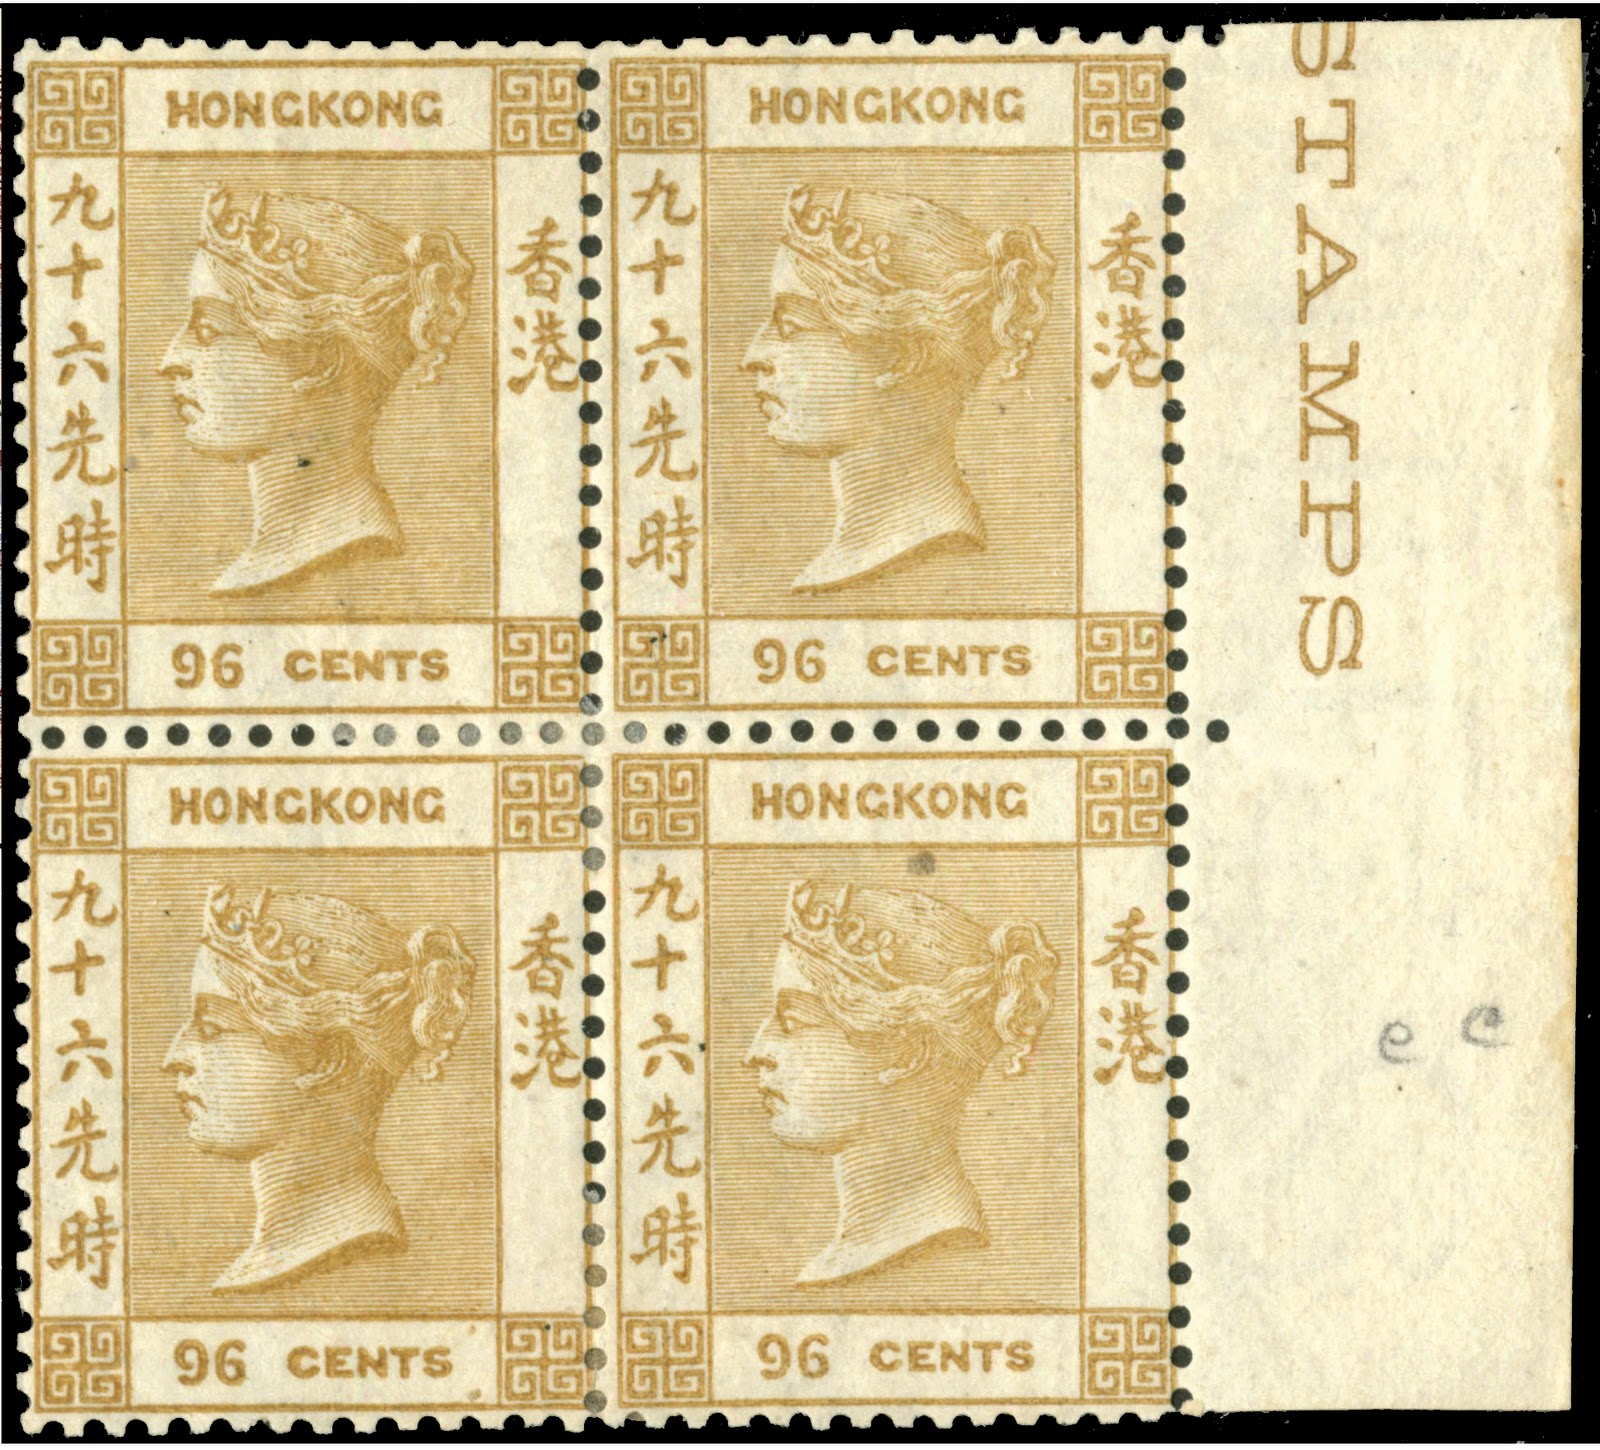 Auction - Four rare Queen Victoria stamps achieved HK$6.4